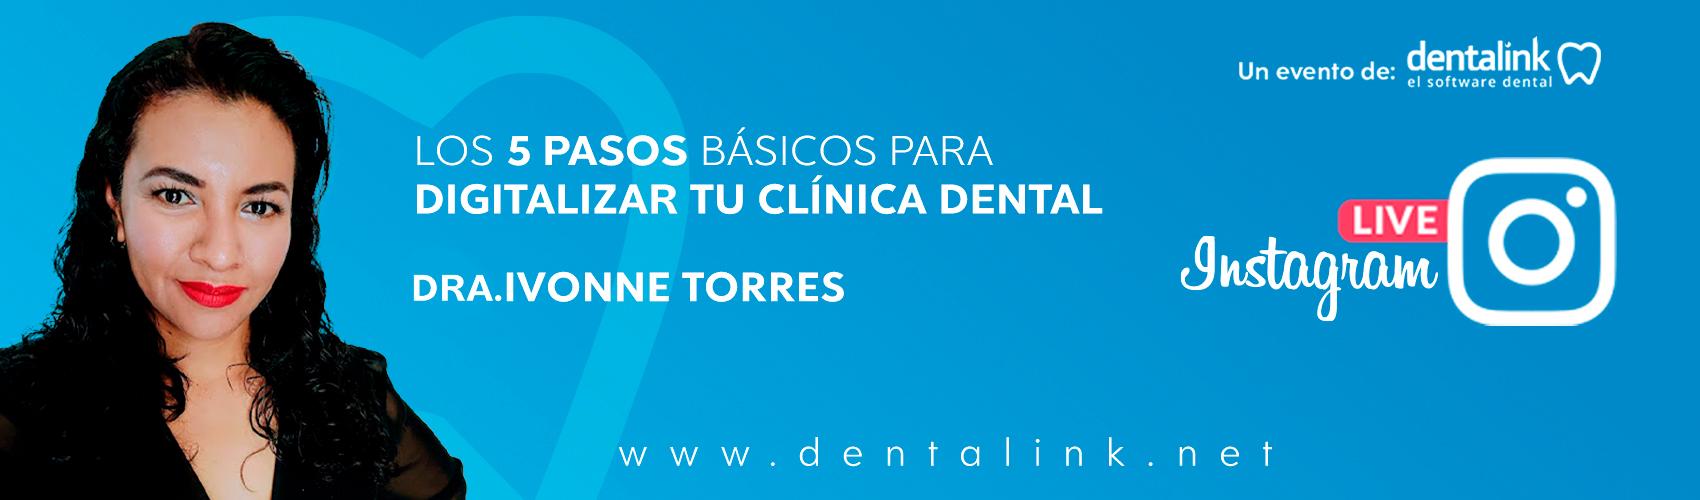 Instagram Live: Los 5 pasos básicos para Digitalizar tu Clínica Dental